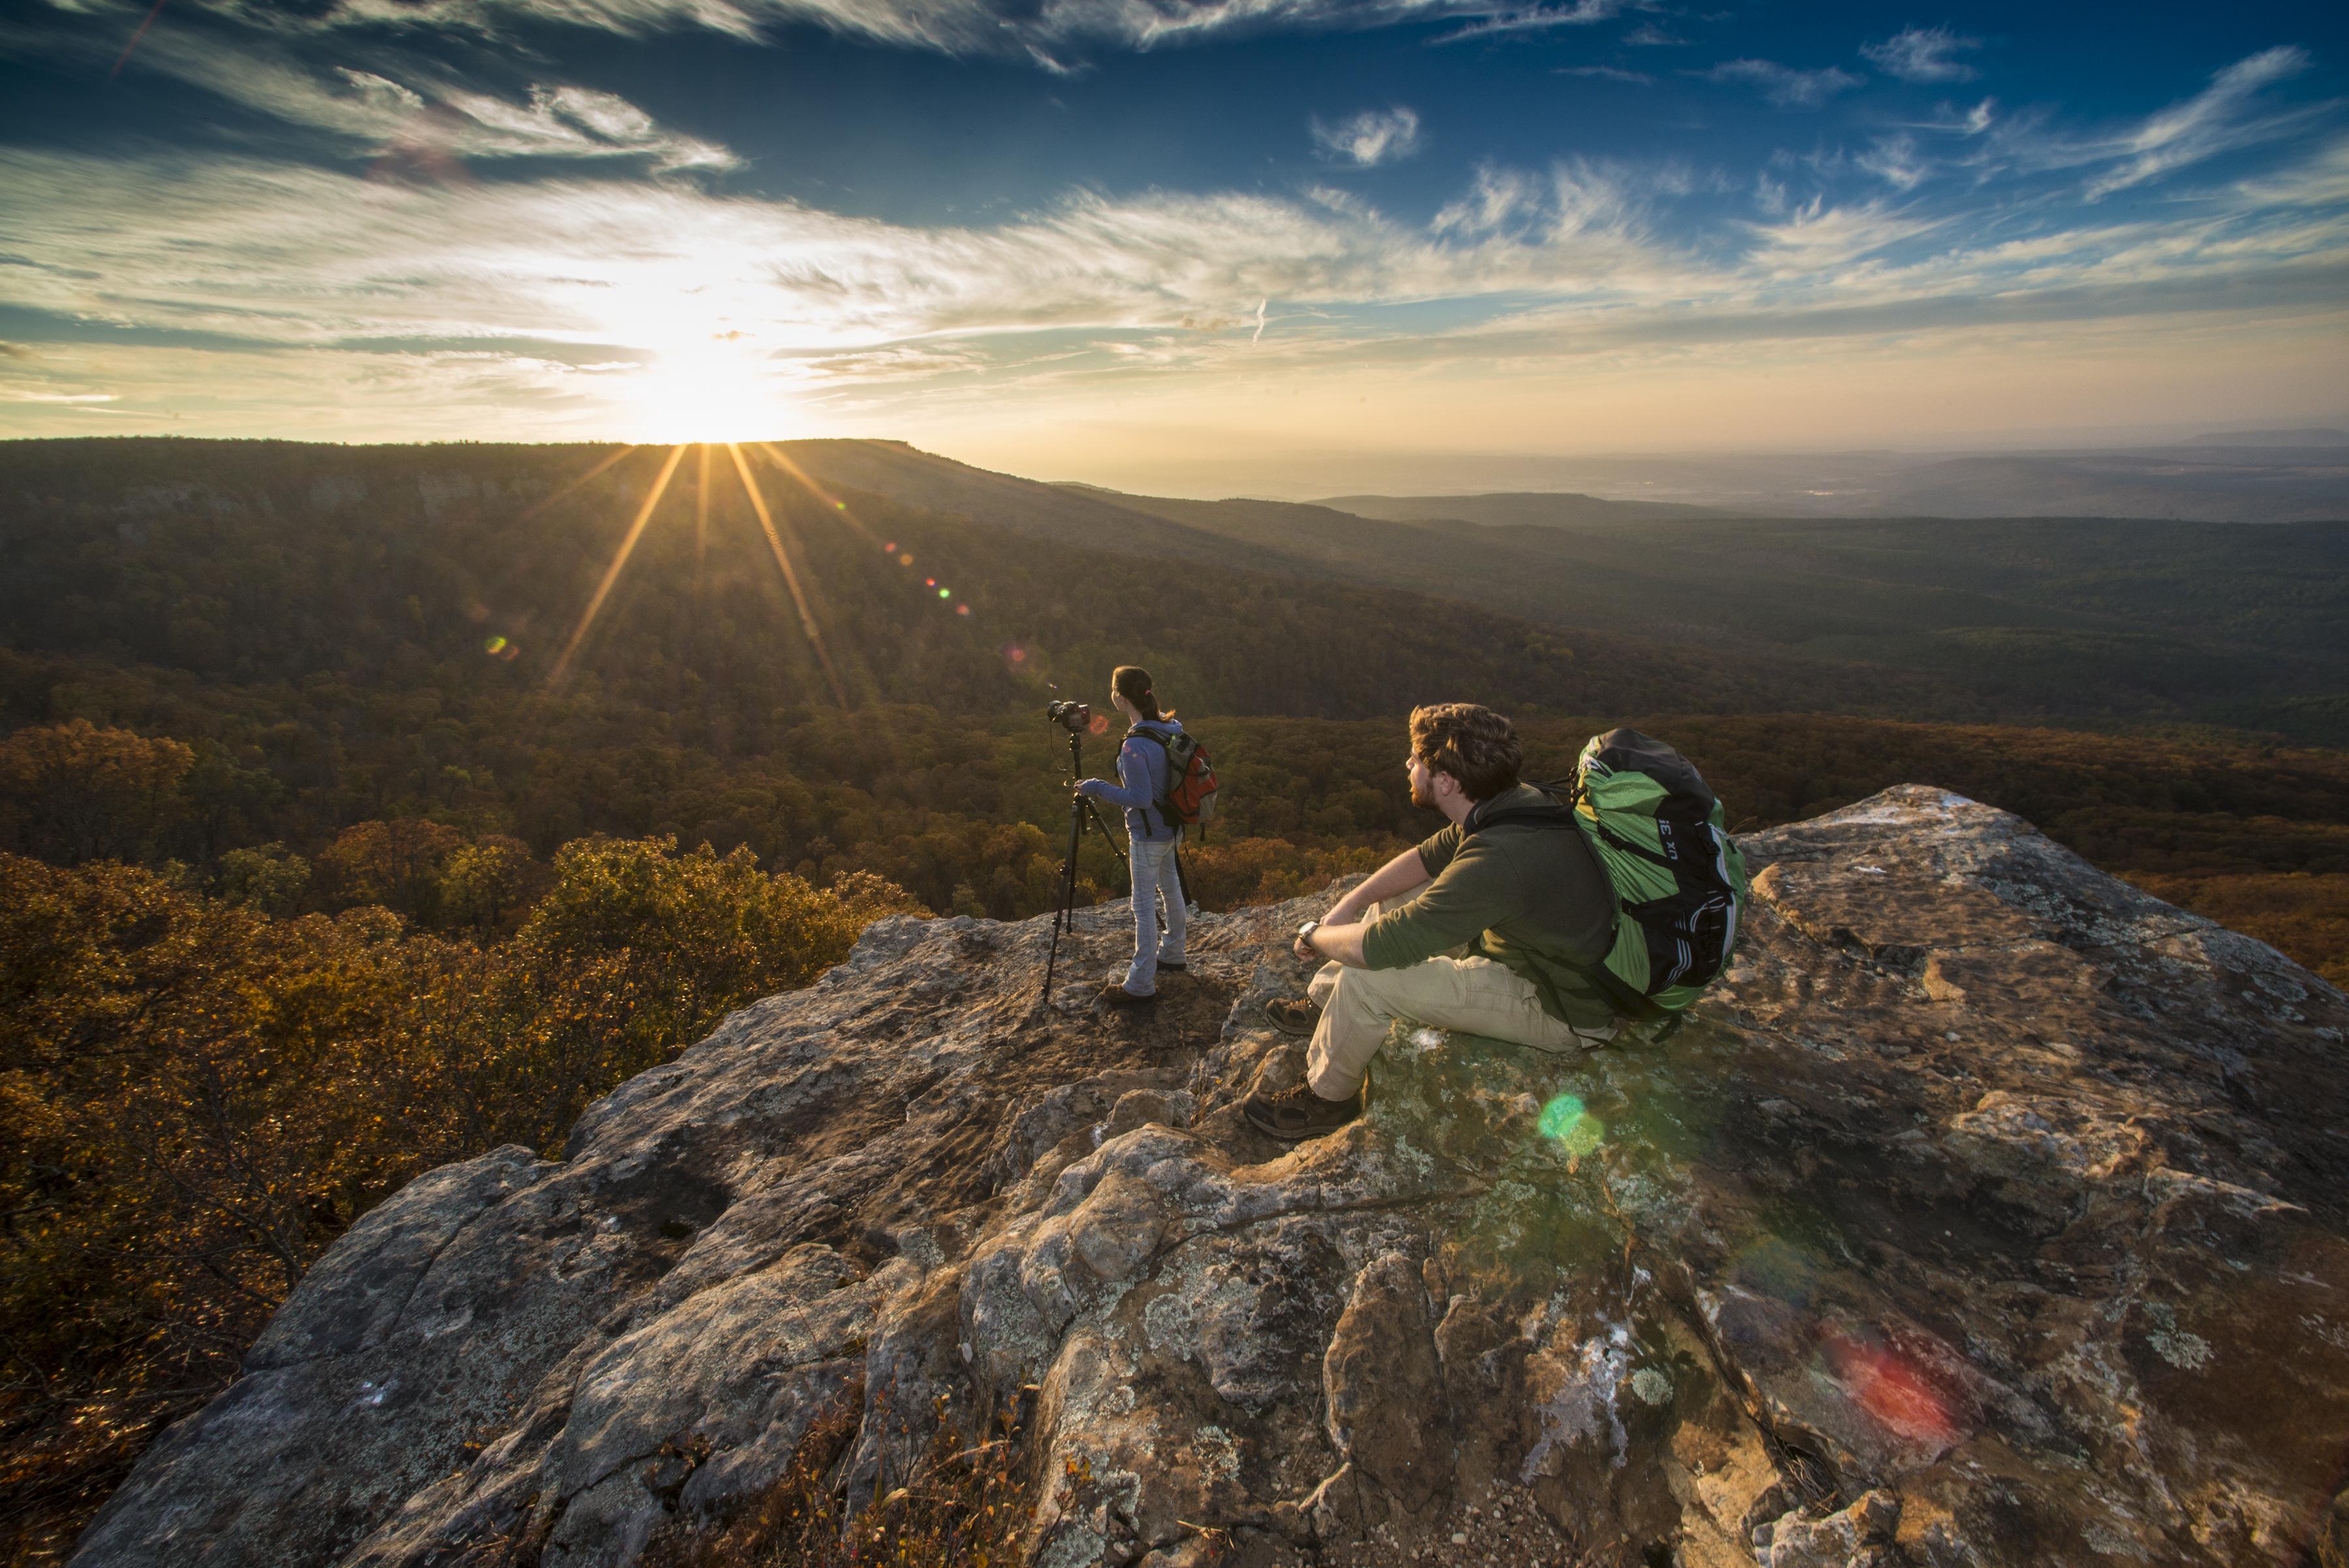 Mount Magazine Camping Arkansas State Parks